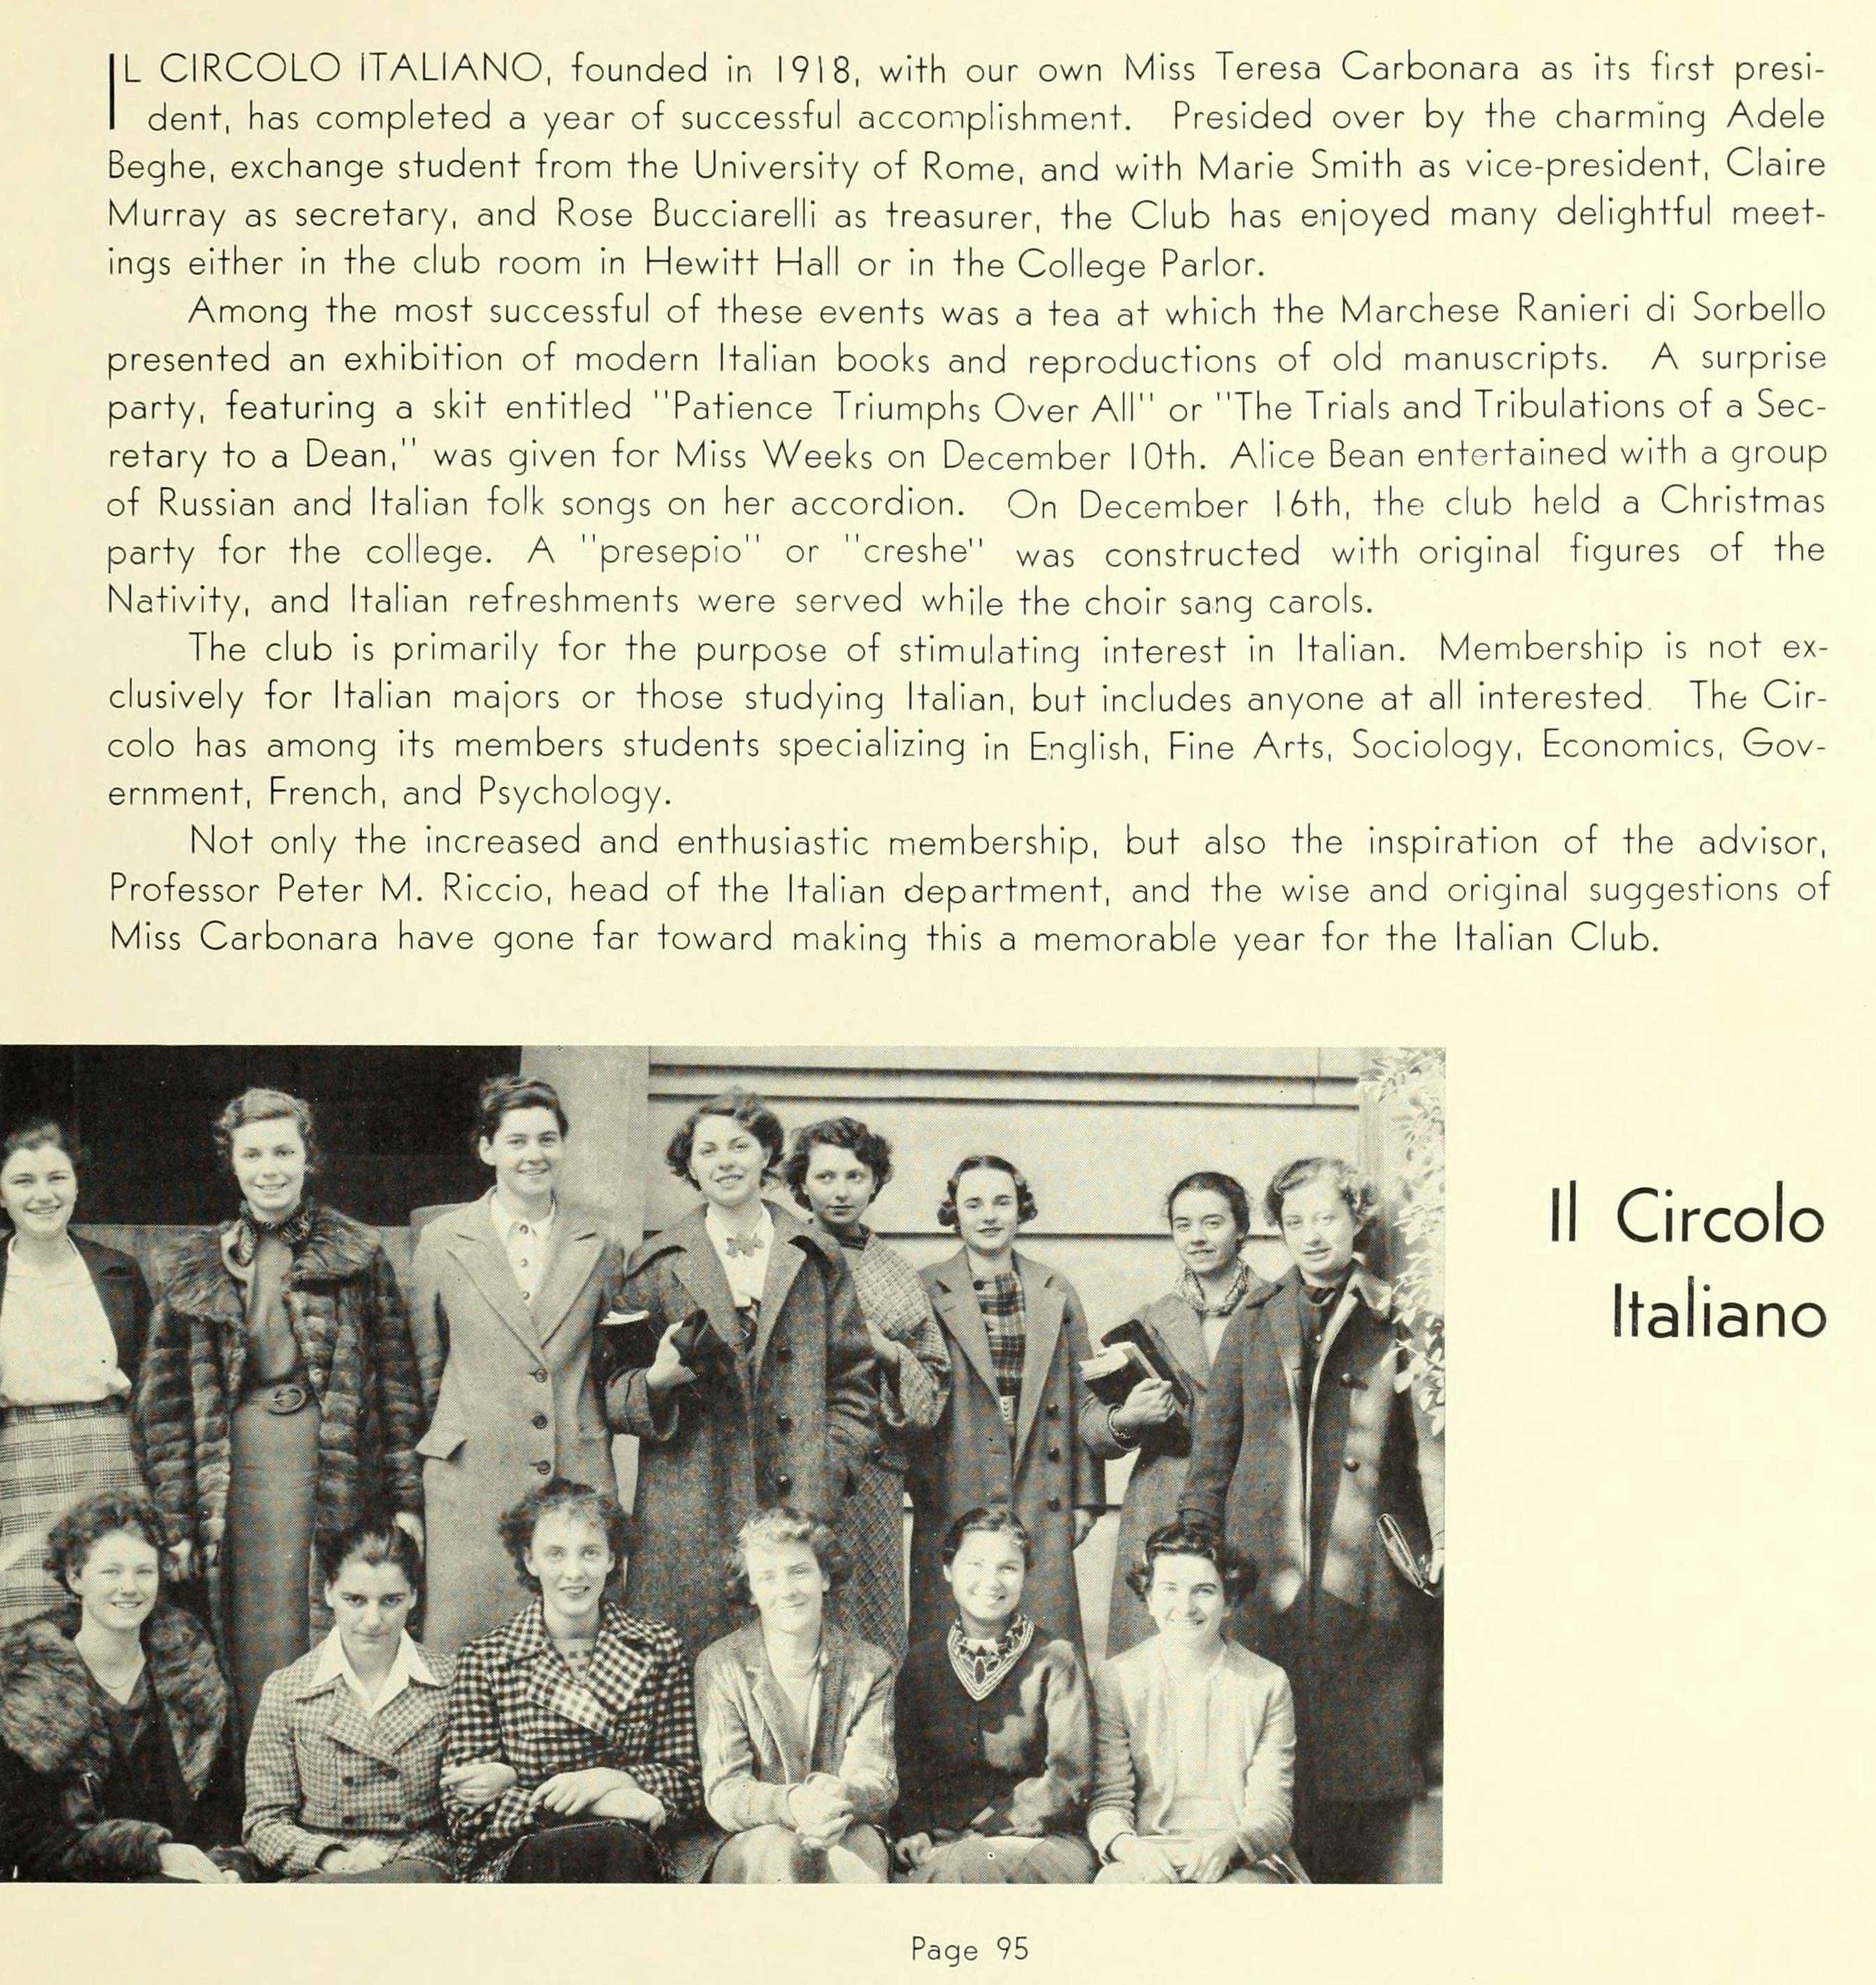 1937 MB - Cirolo Italiano.jpg